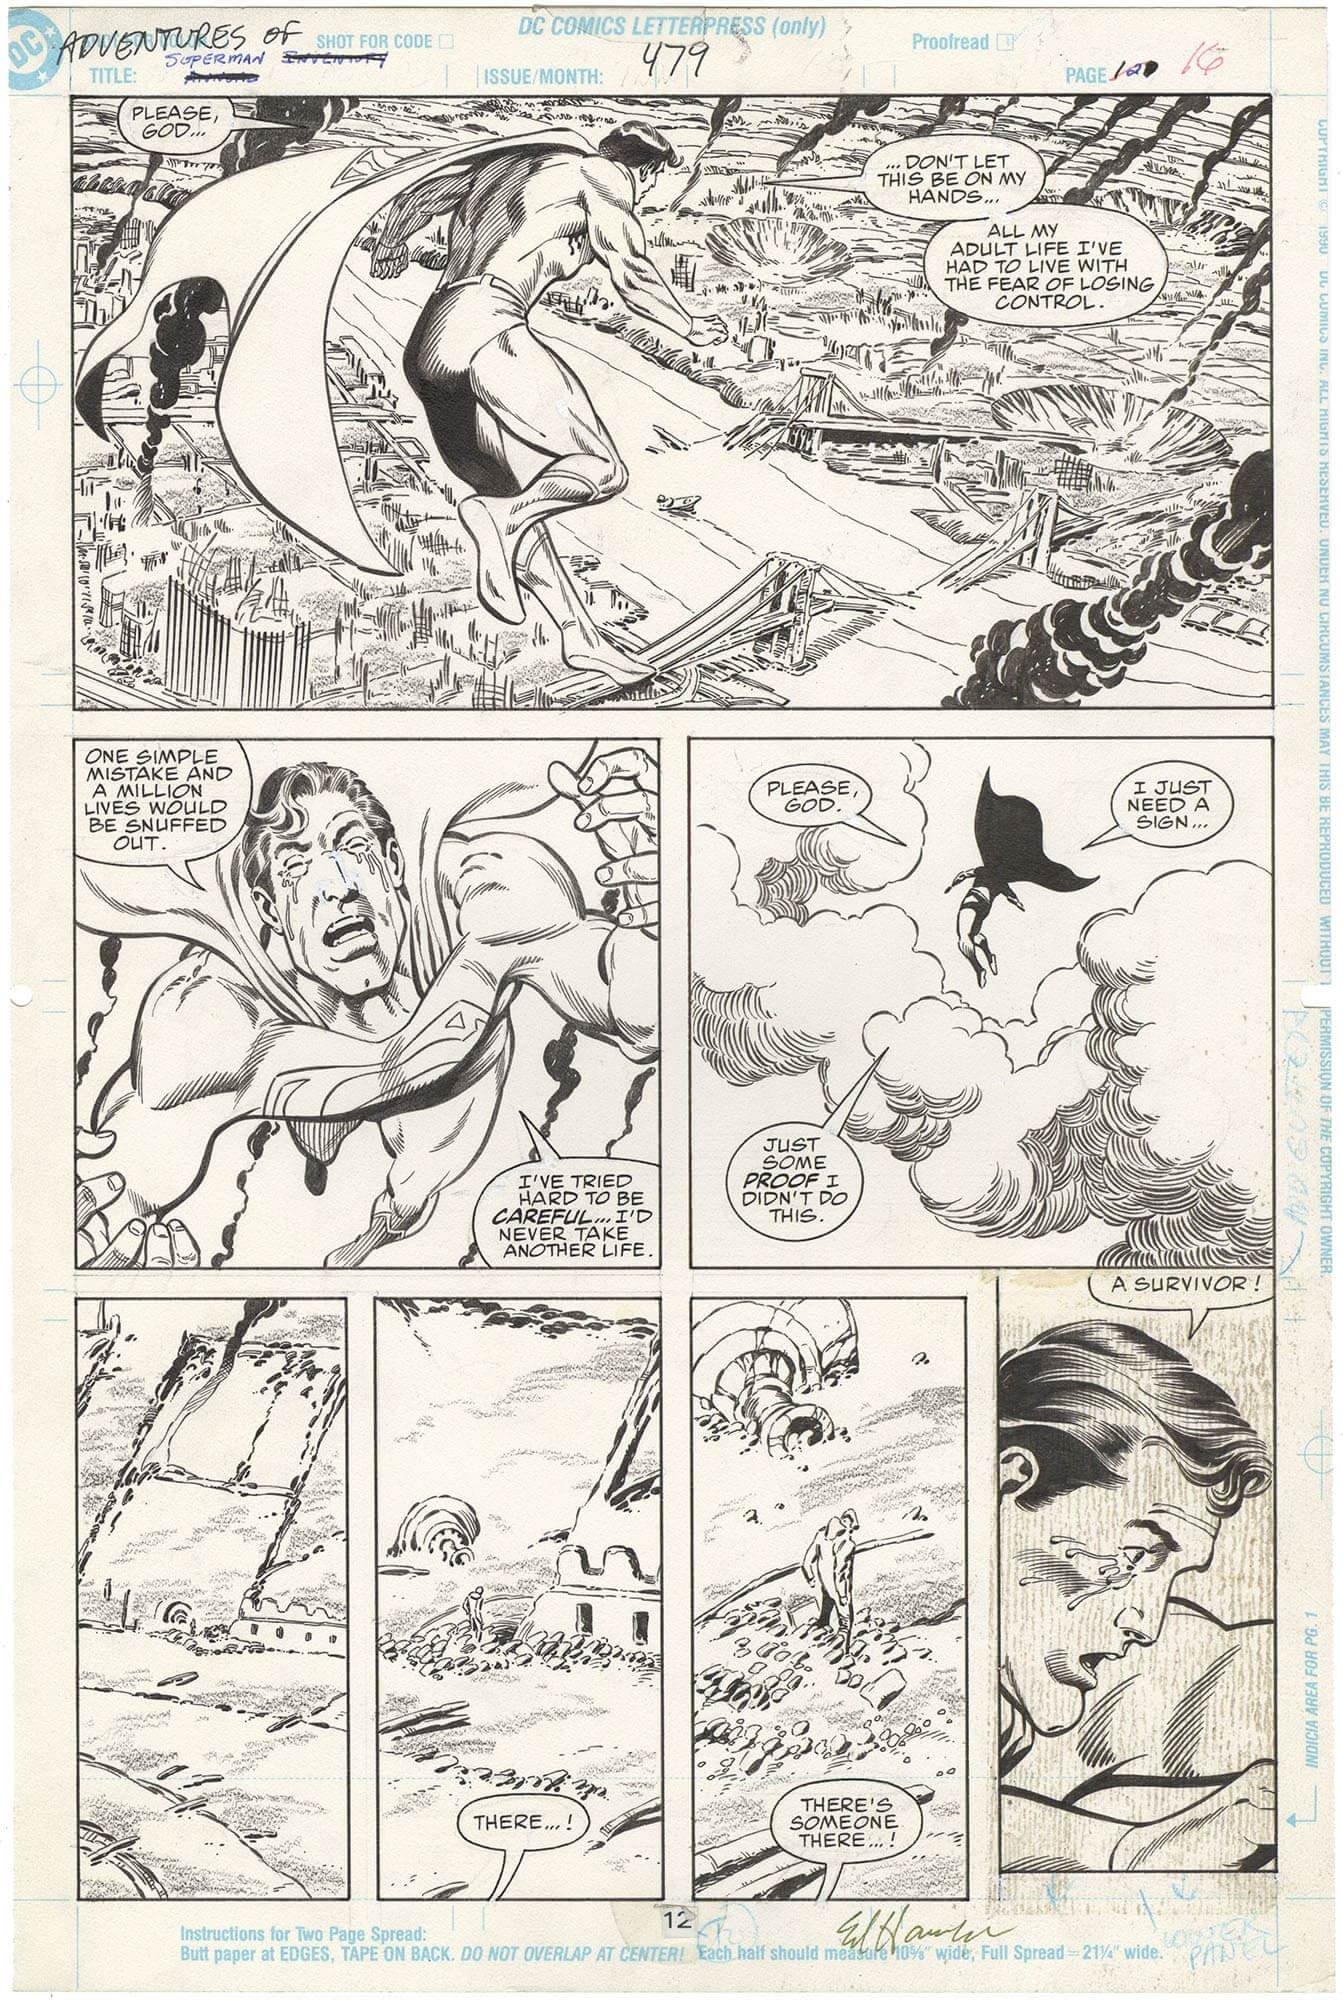 Adventures of Superman #479 p12